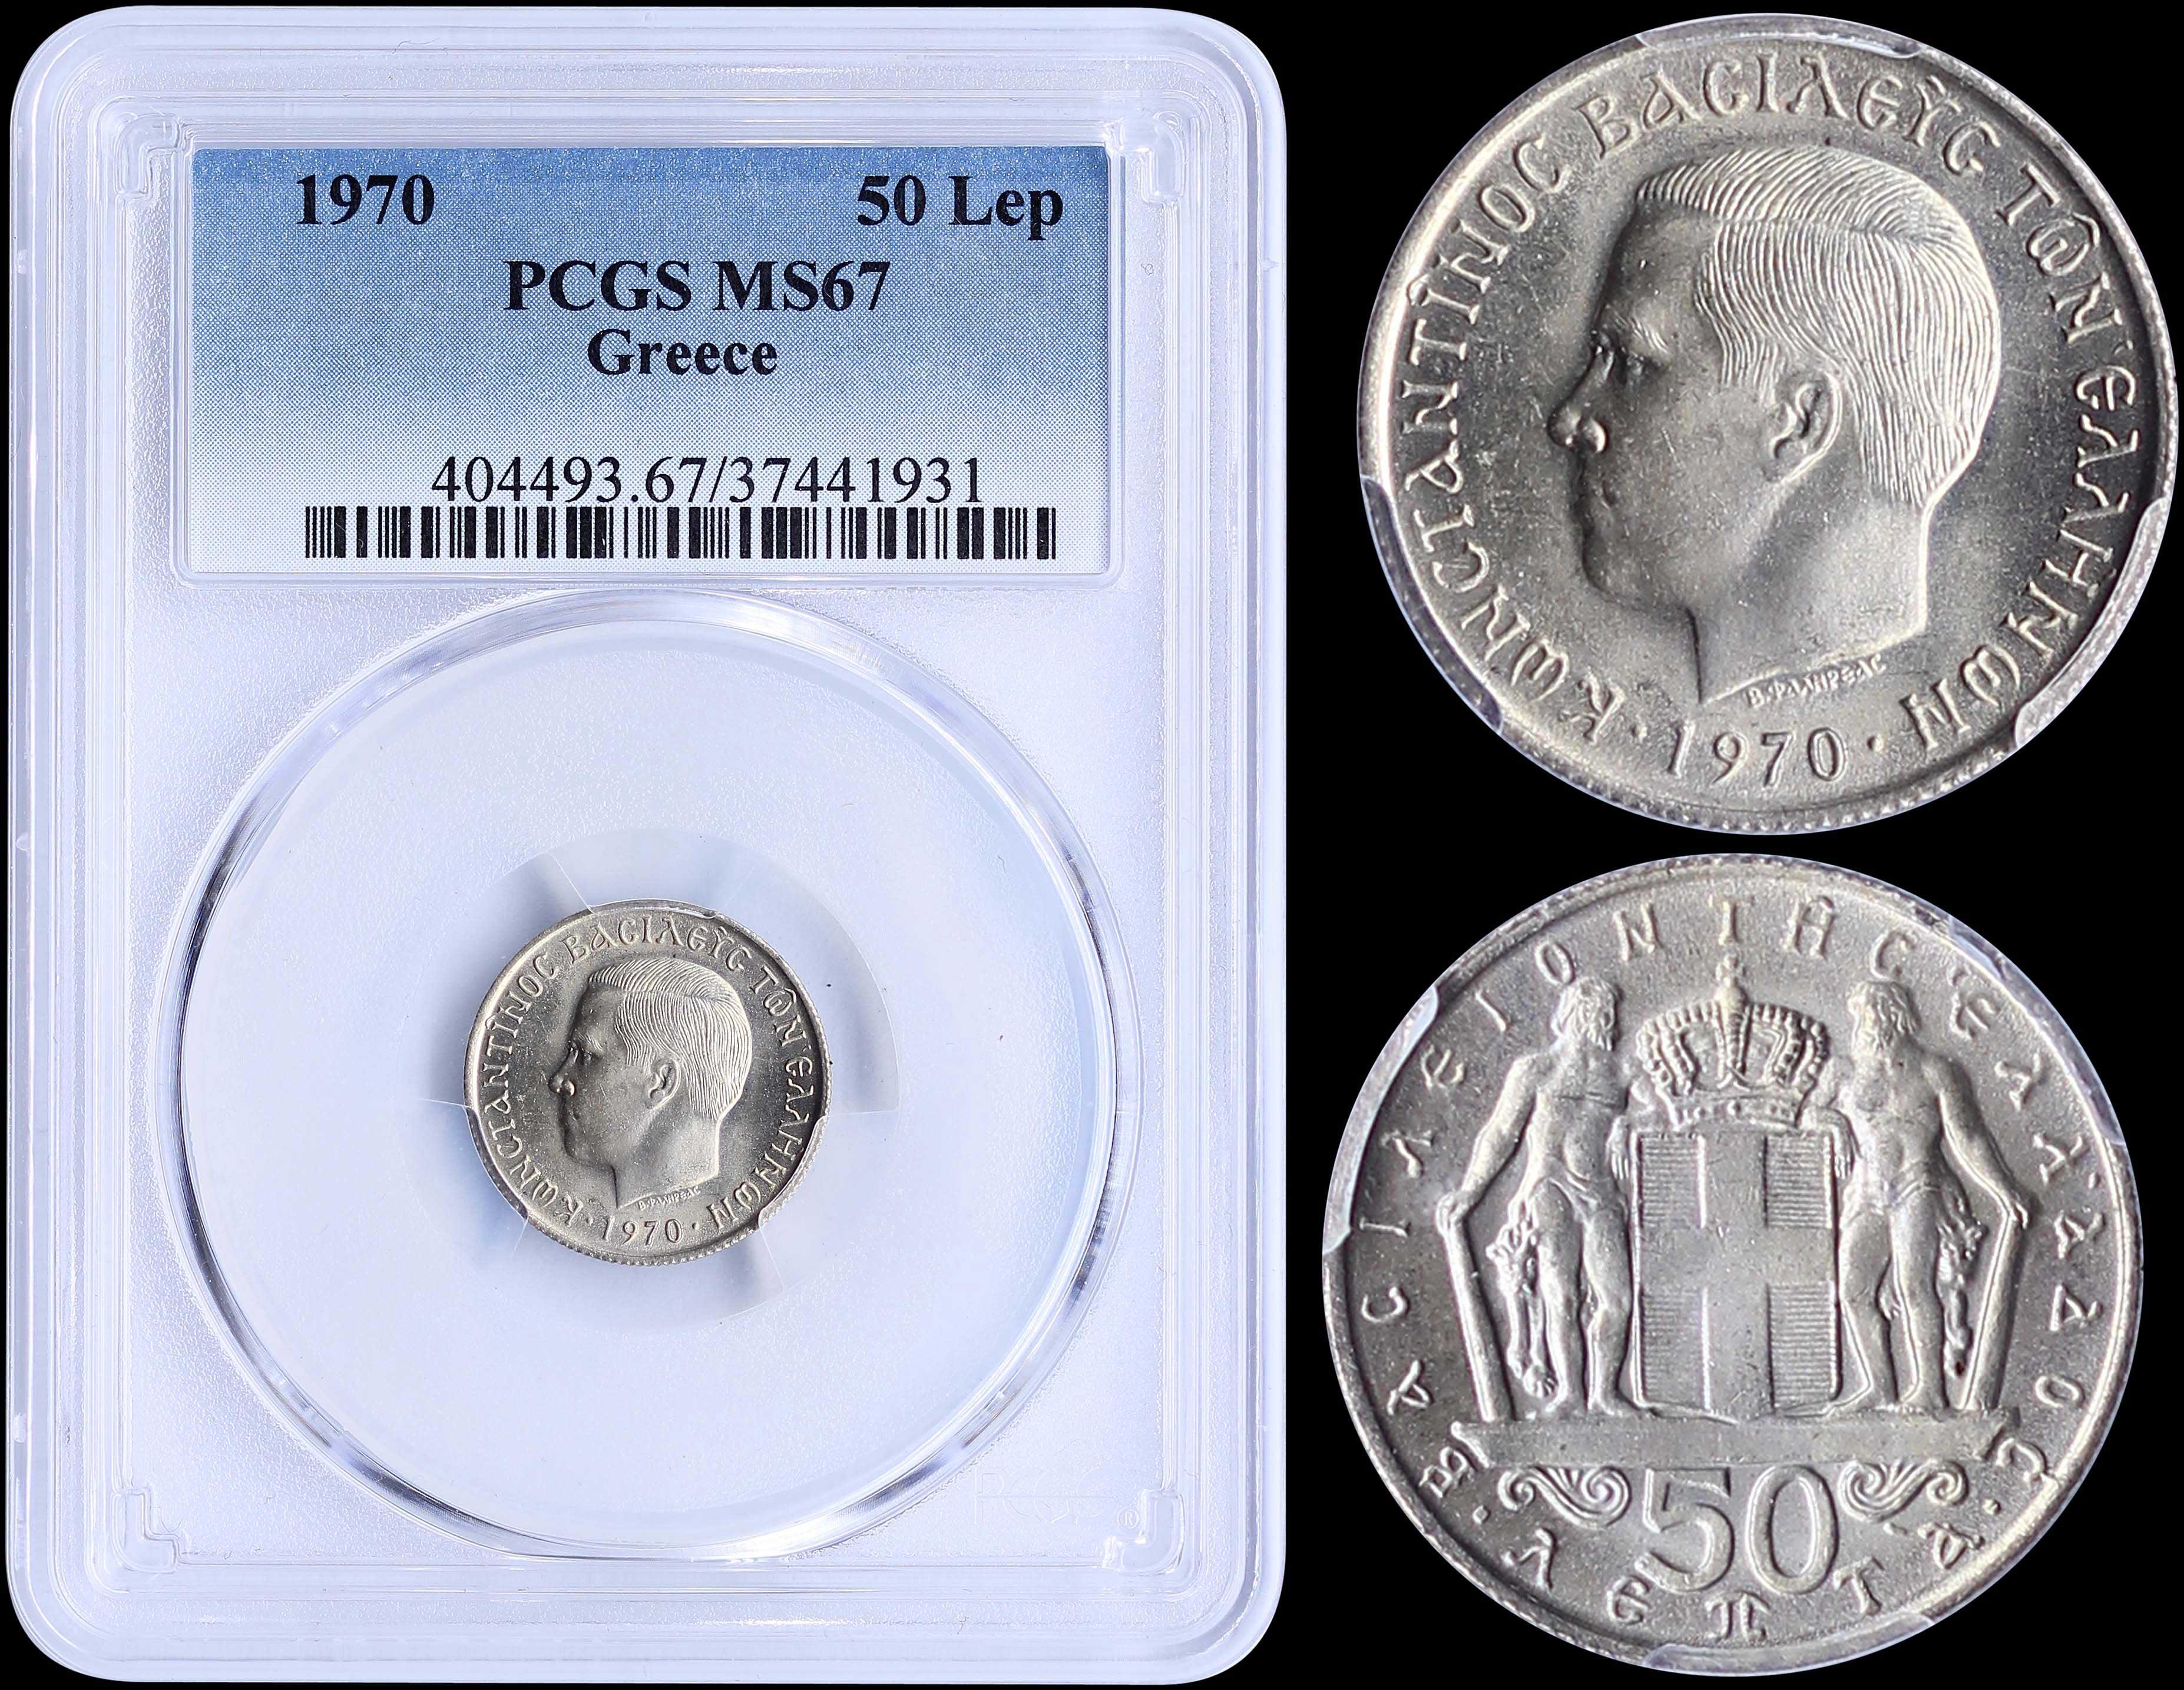 Lot 8217 - -  COINS & TOKENS king constantine ii -  A. Karamitsos Public & Live Bid Auction 644 Coins, Medals & Banknotes